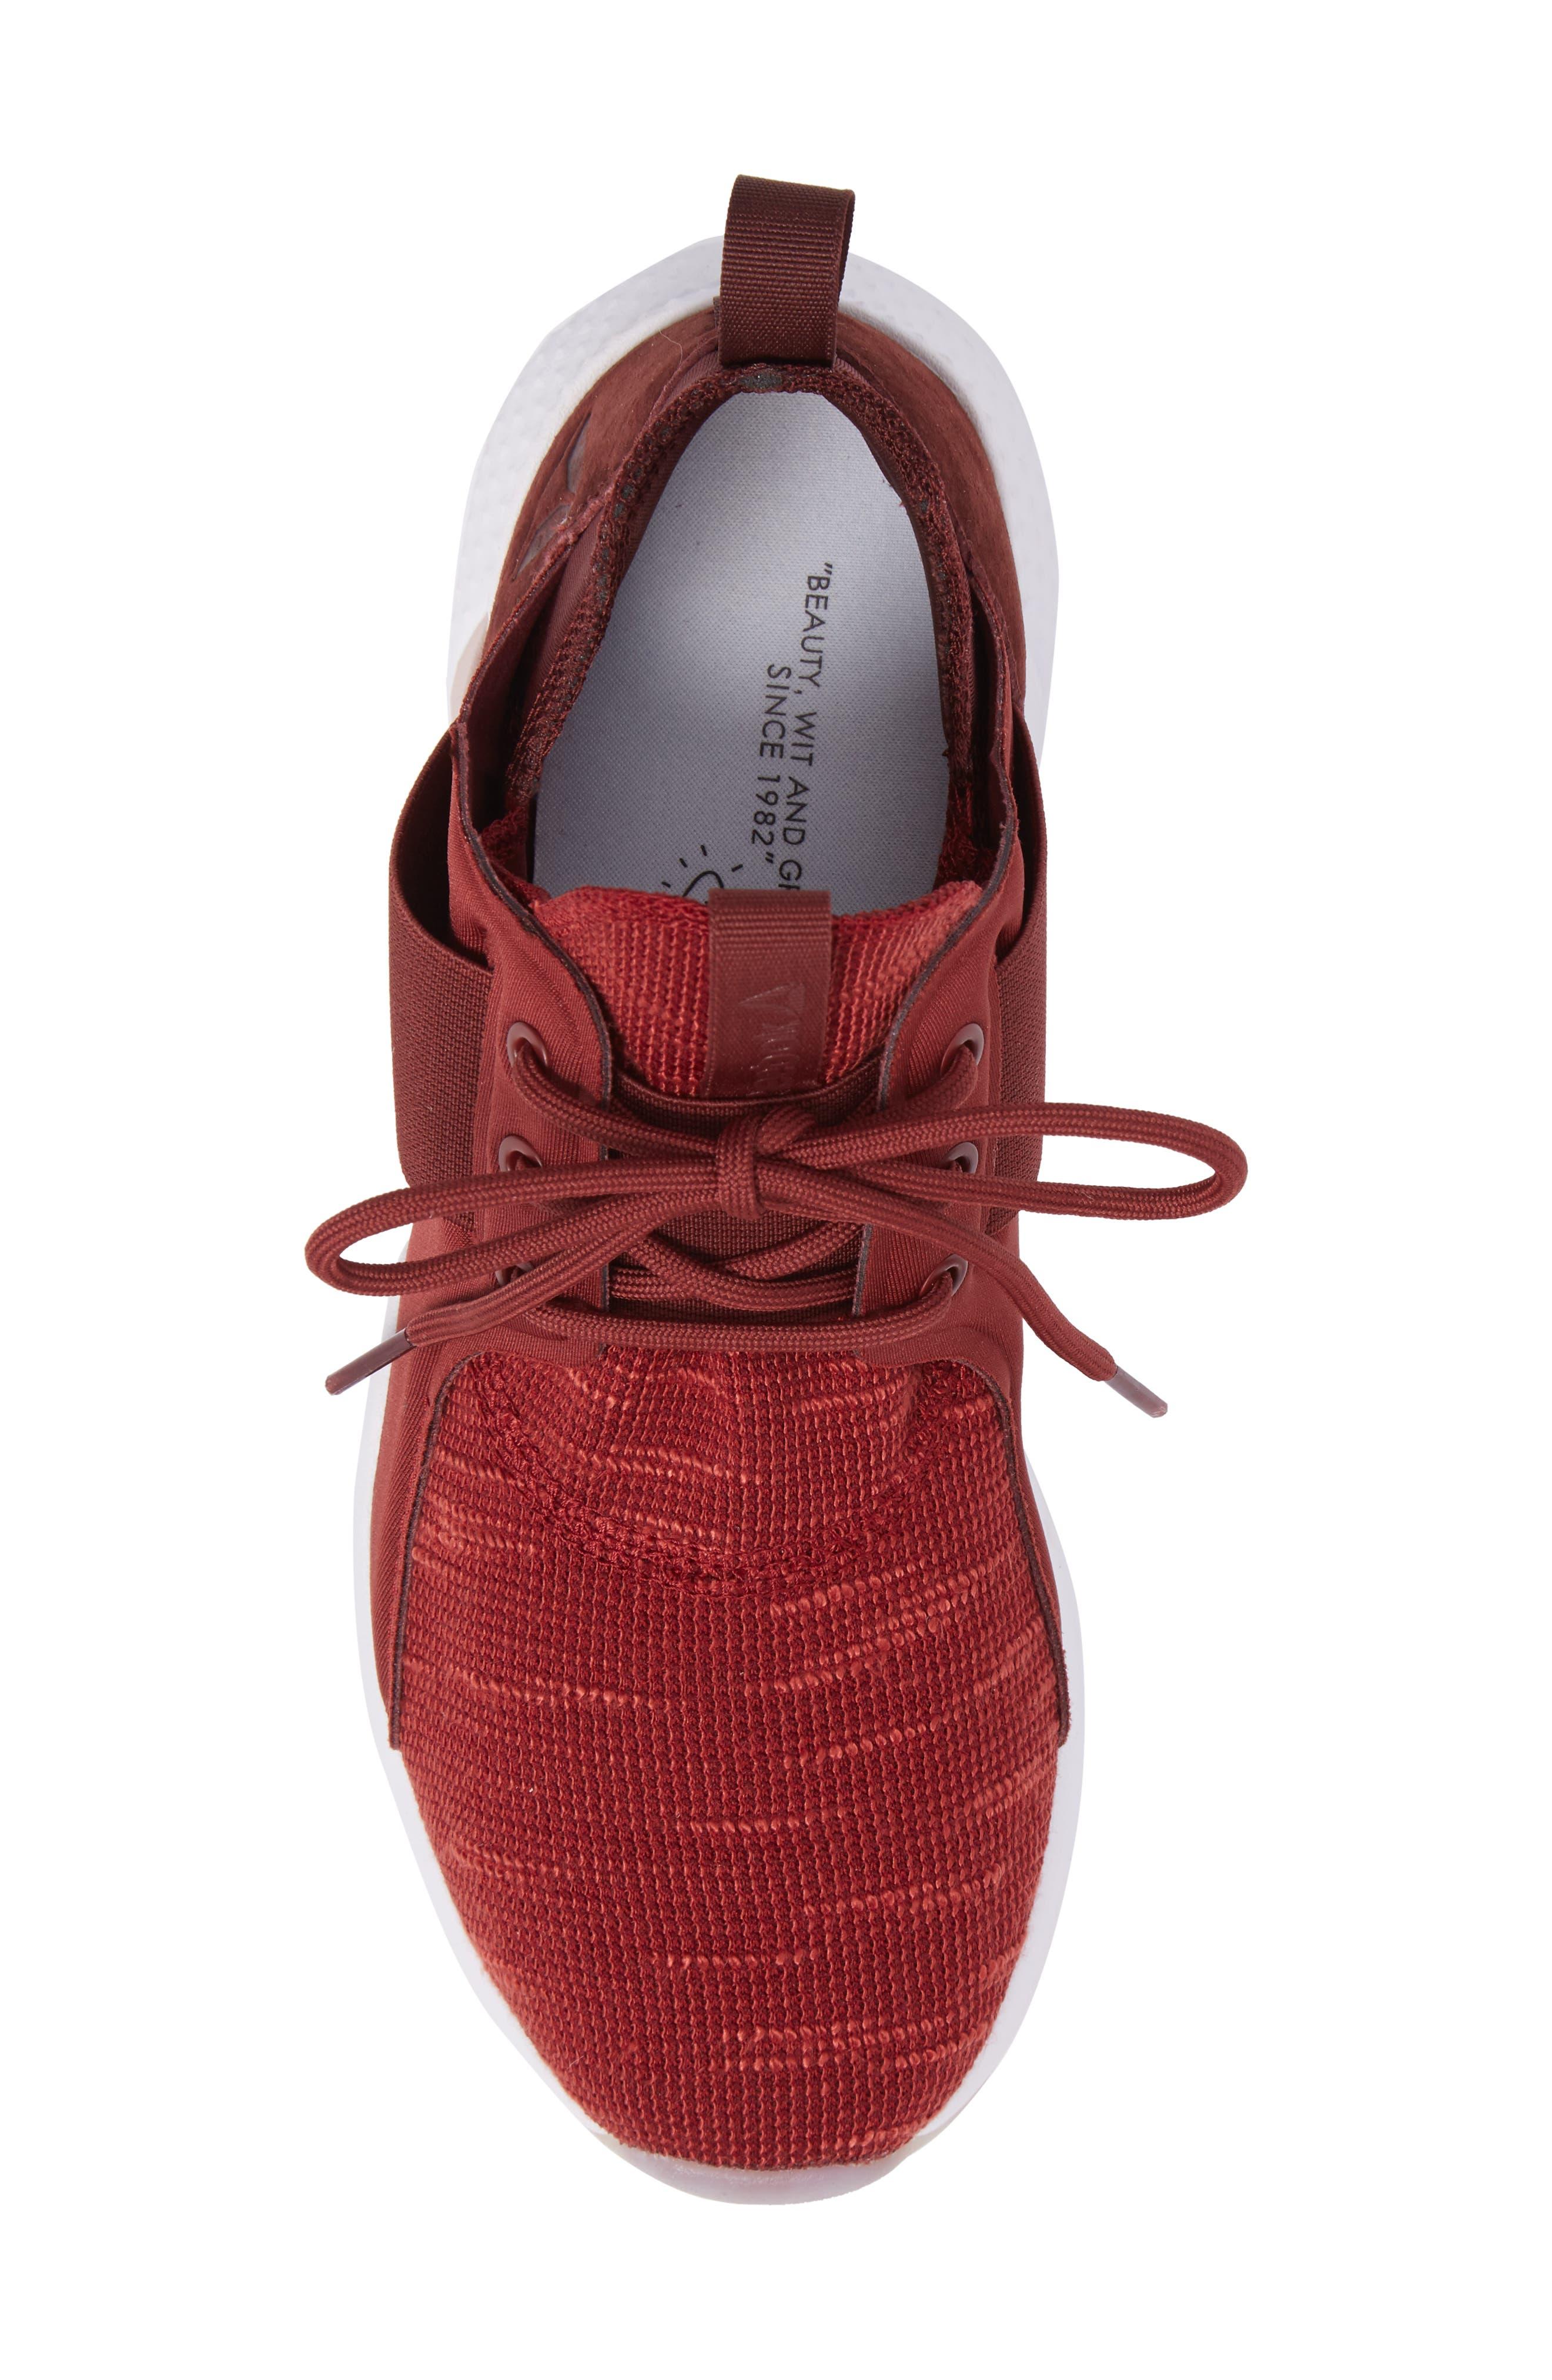 Guresu 1.0 Training Shoe,                             Alternate thumbnail 26, color,